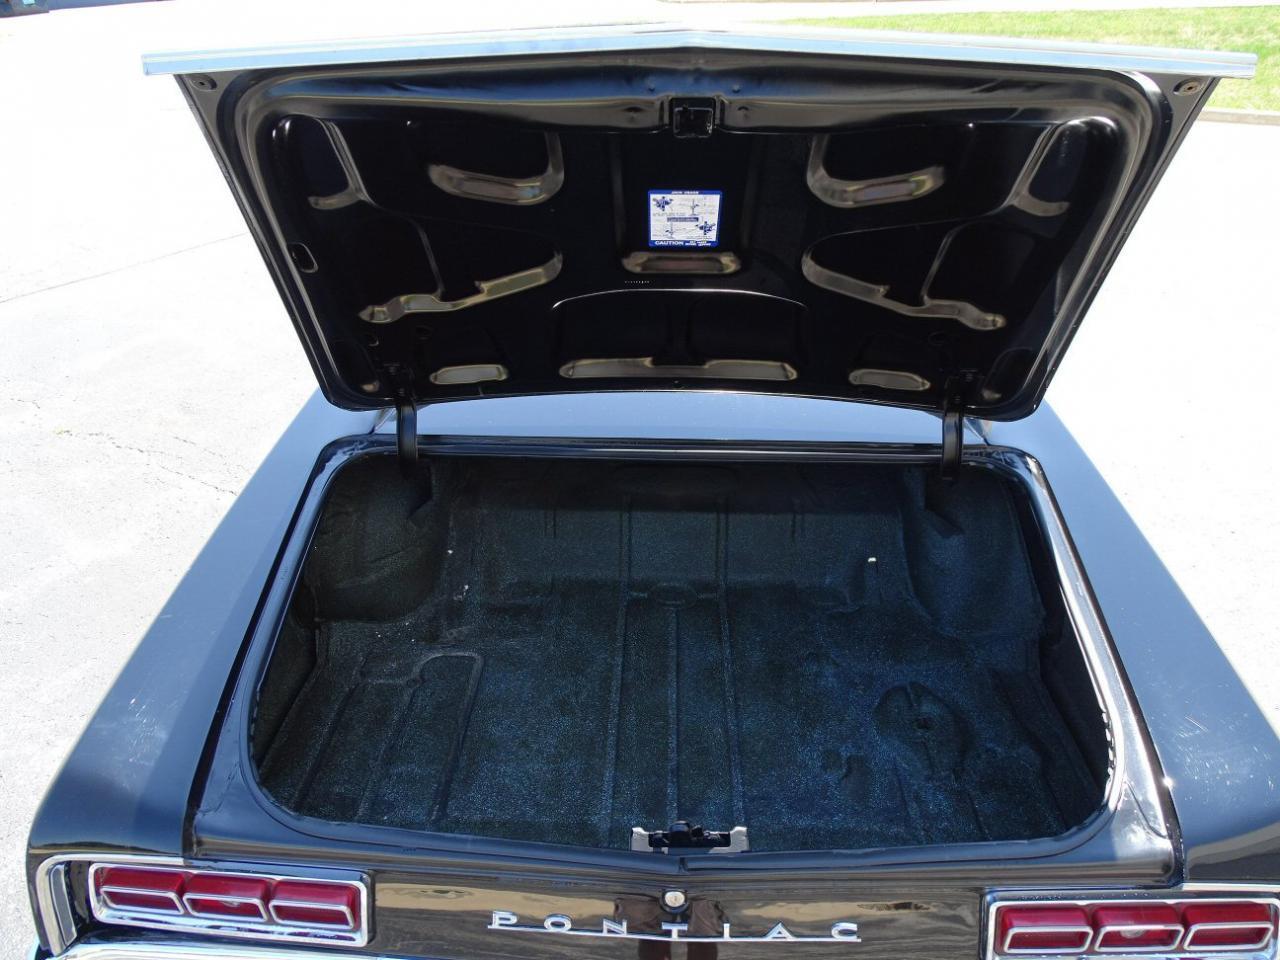 Large Picture of '67 Pontiac LeMans located in Crete Illinois - $22,595.00 - LH9D